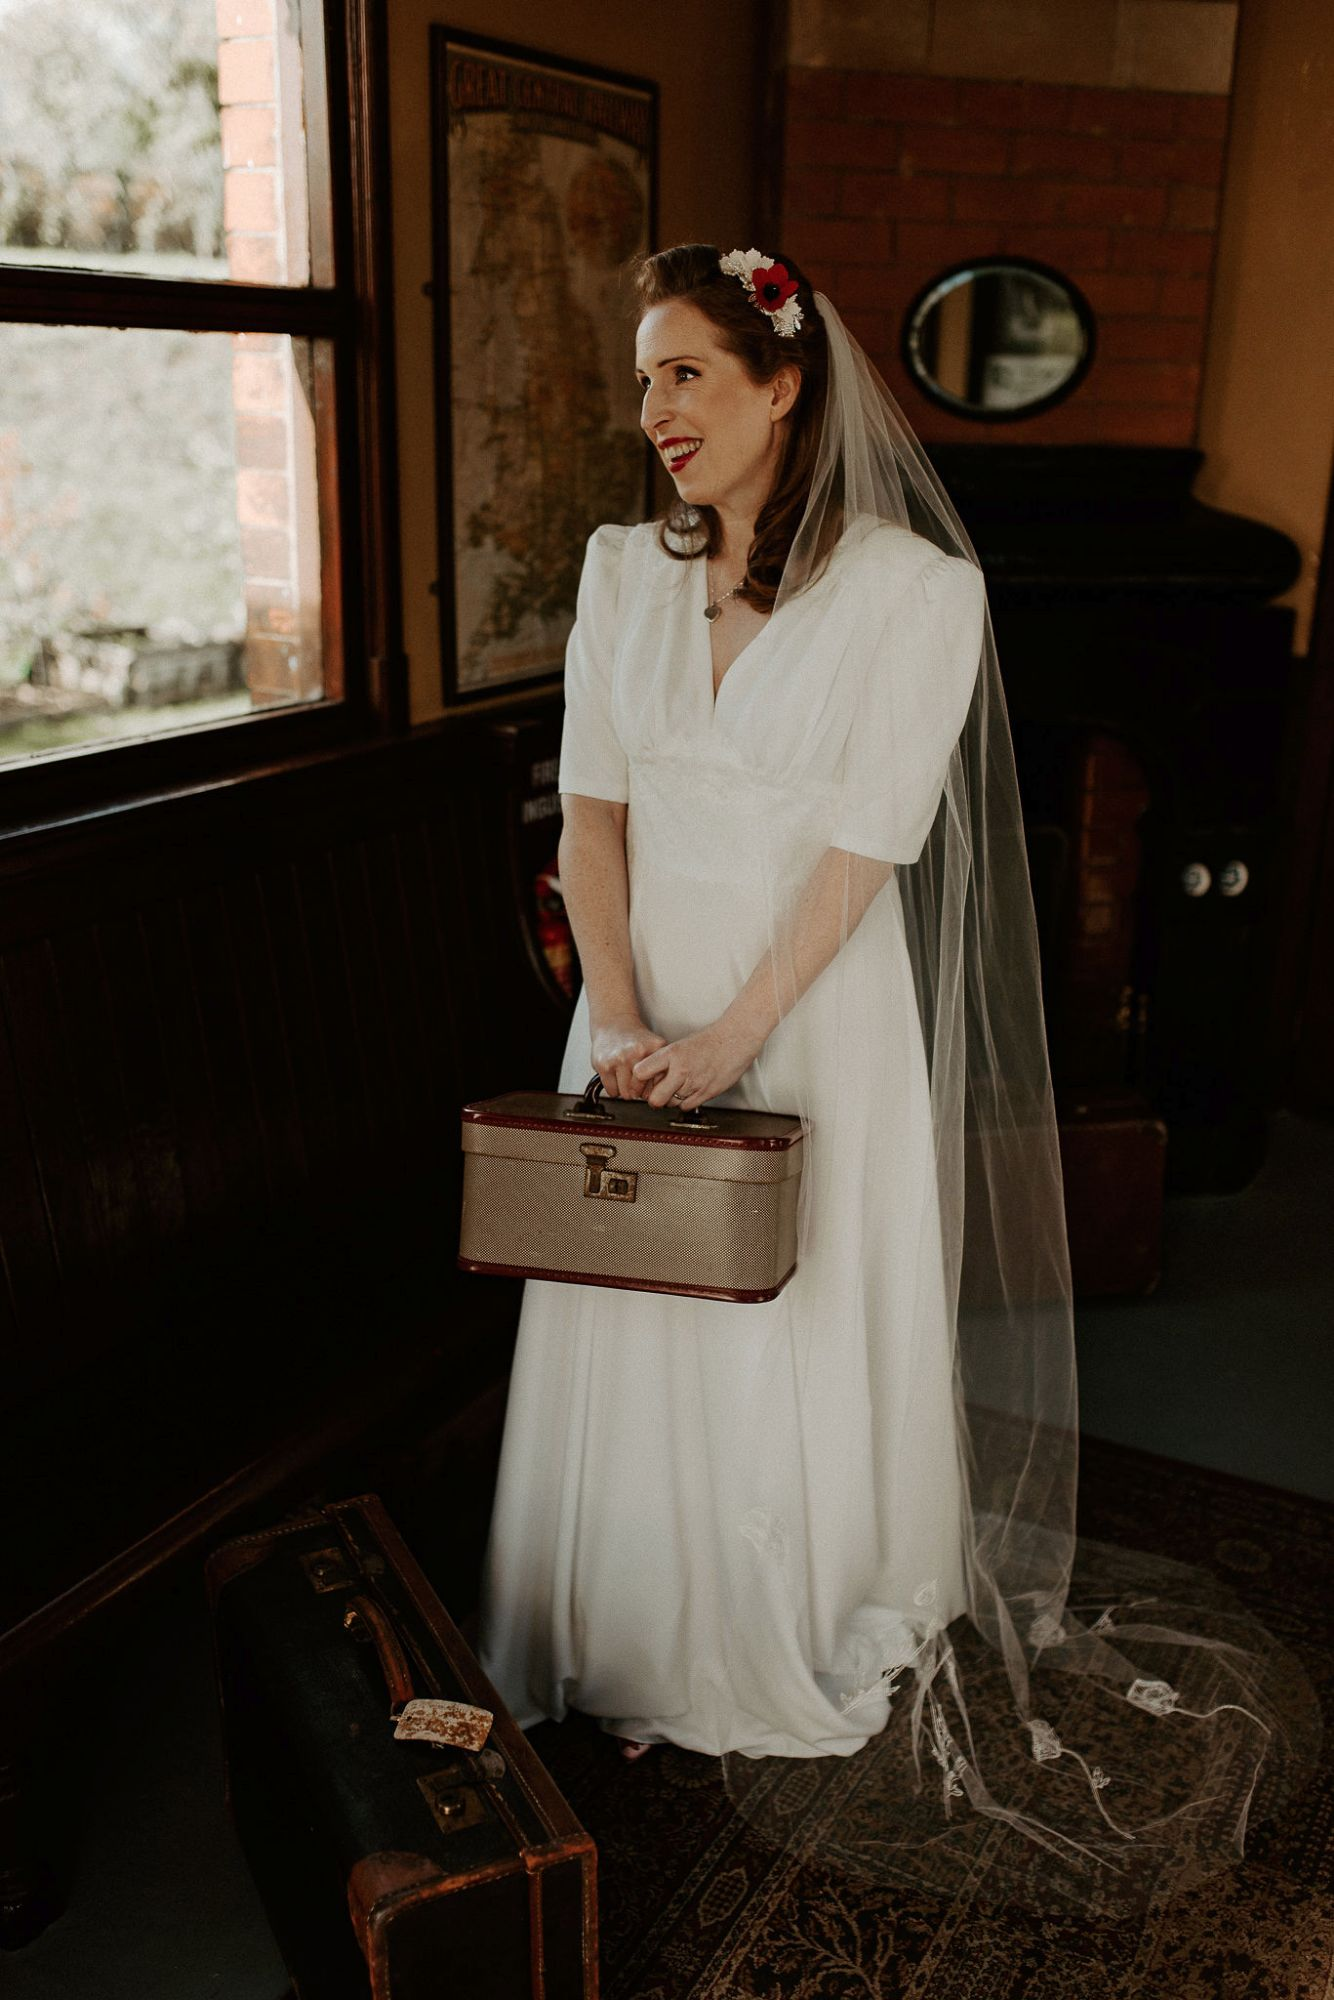 1940s_vintage_style_wedding_dress